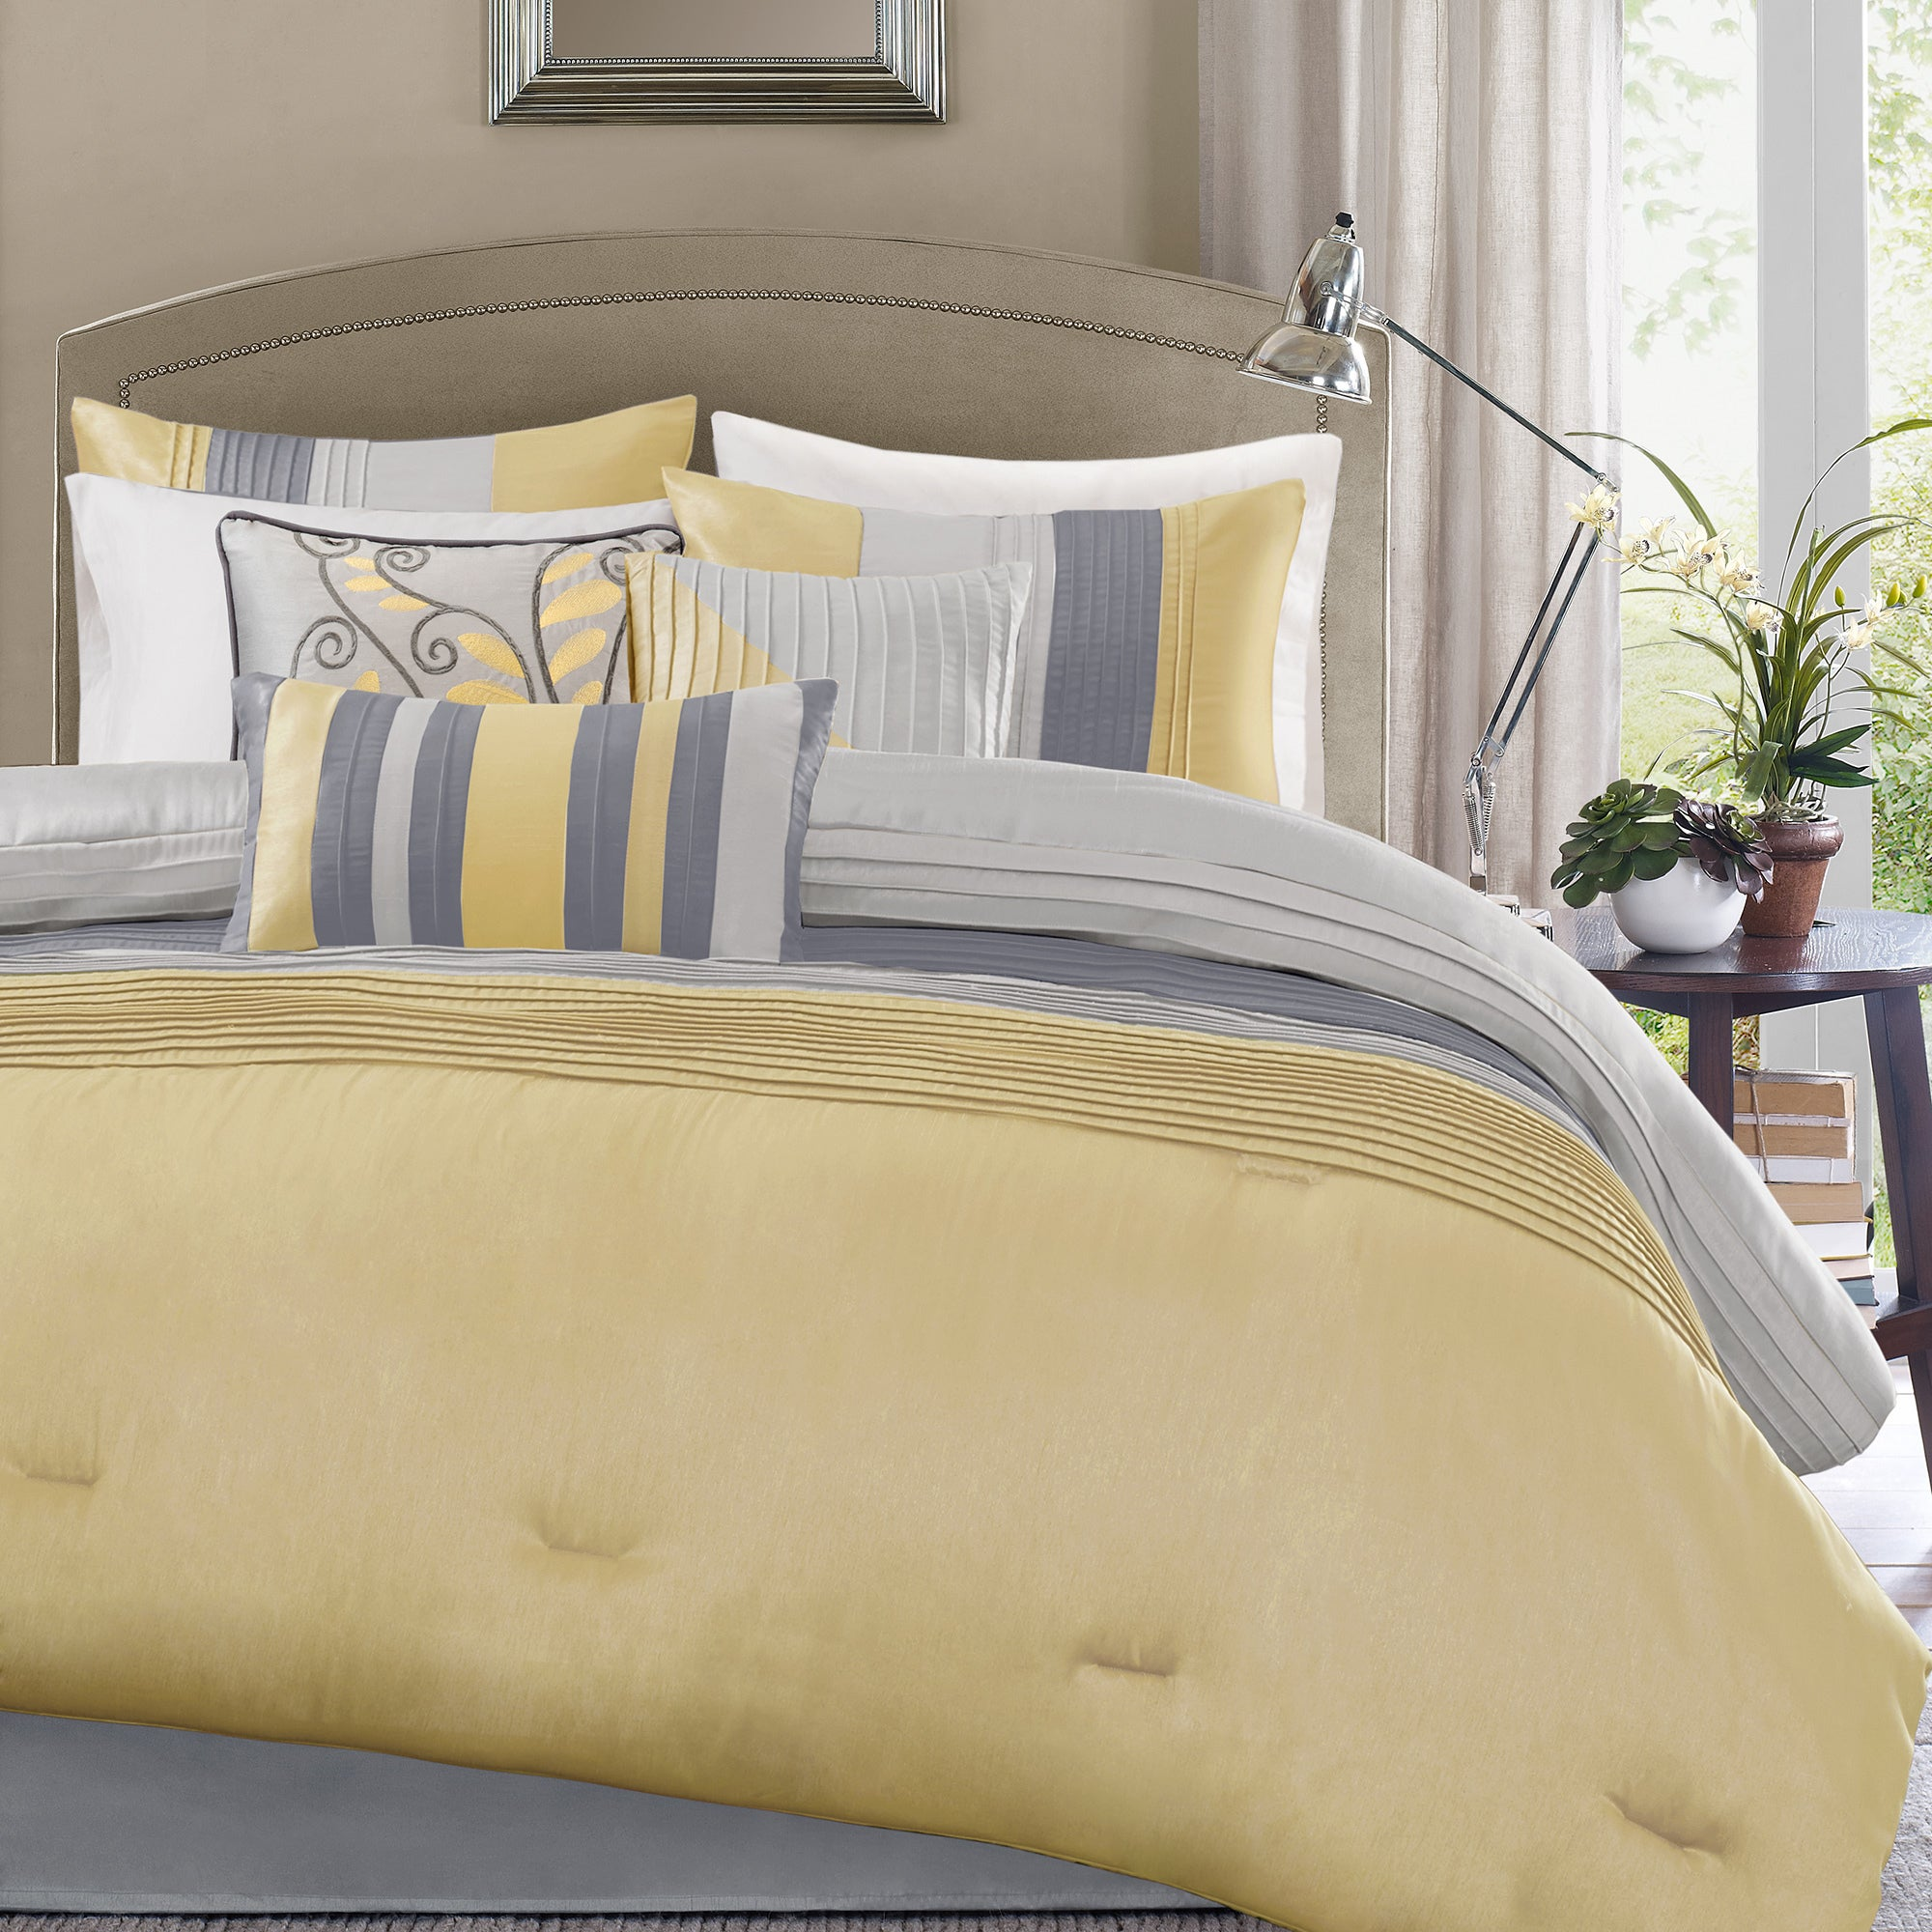 jacquard bed product maize comforter bedding habitat set com cotton urban overstock free bath pink